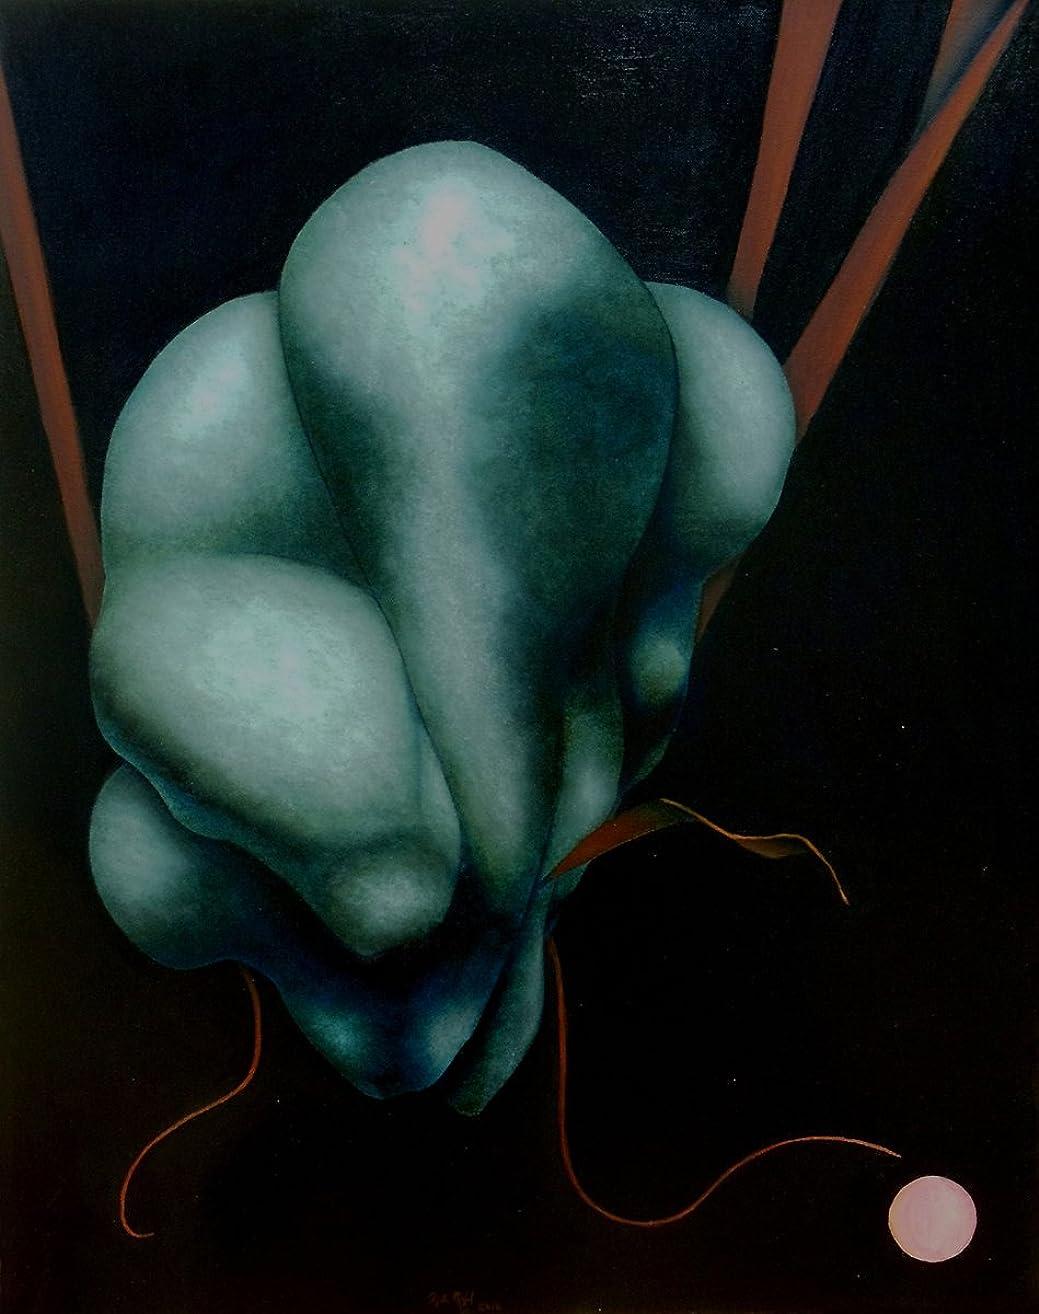 Toque Divino (Divine Touch), Original Oil on Canvas by Héctor Rafael